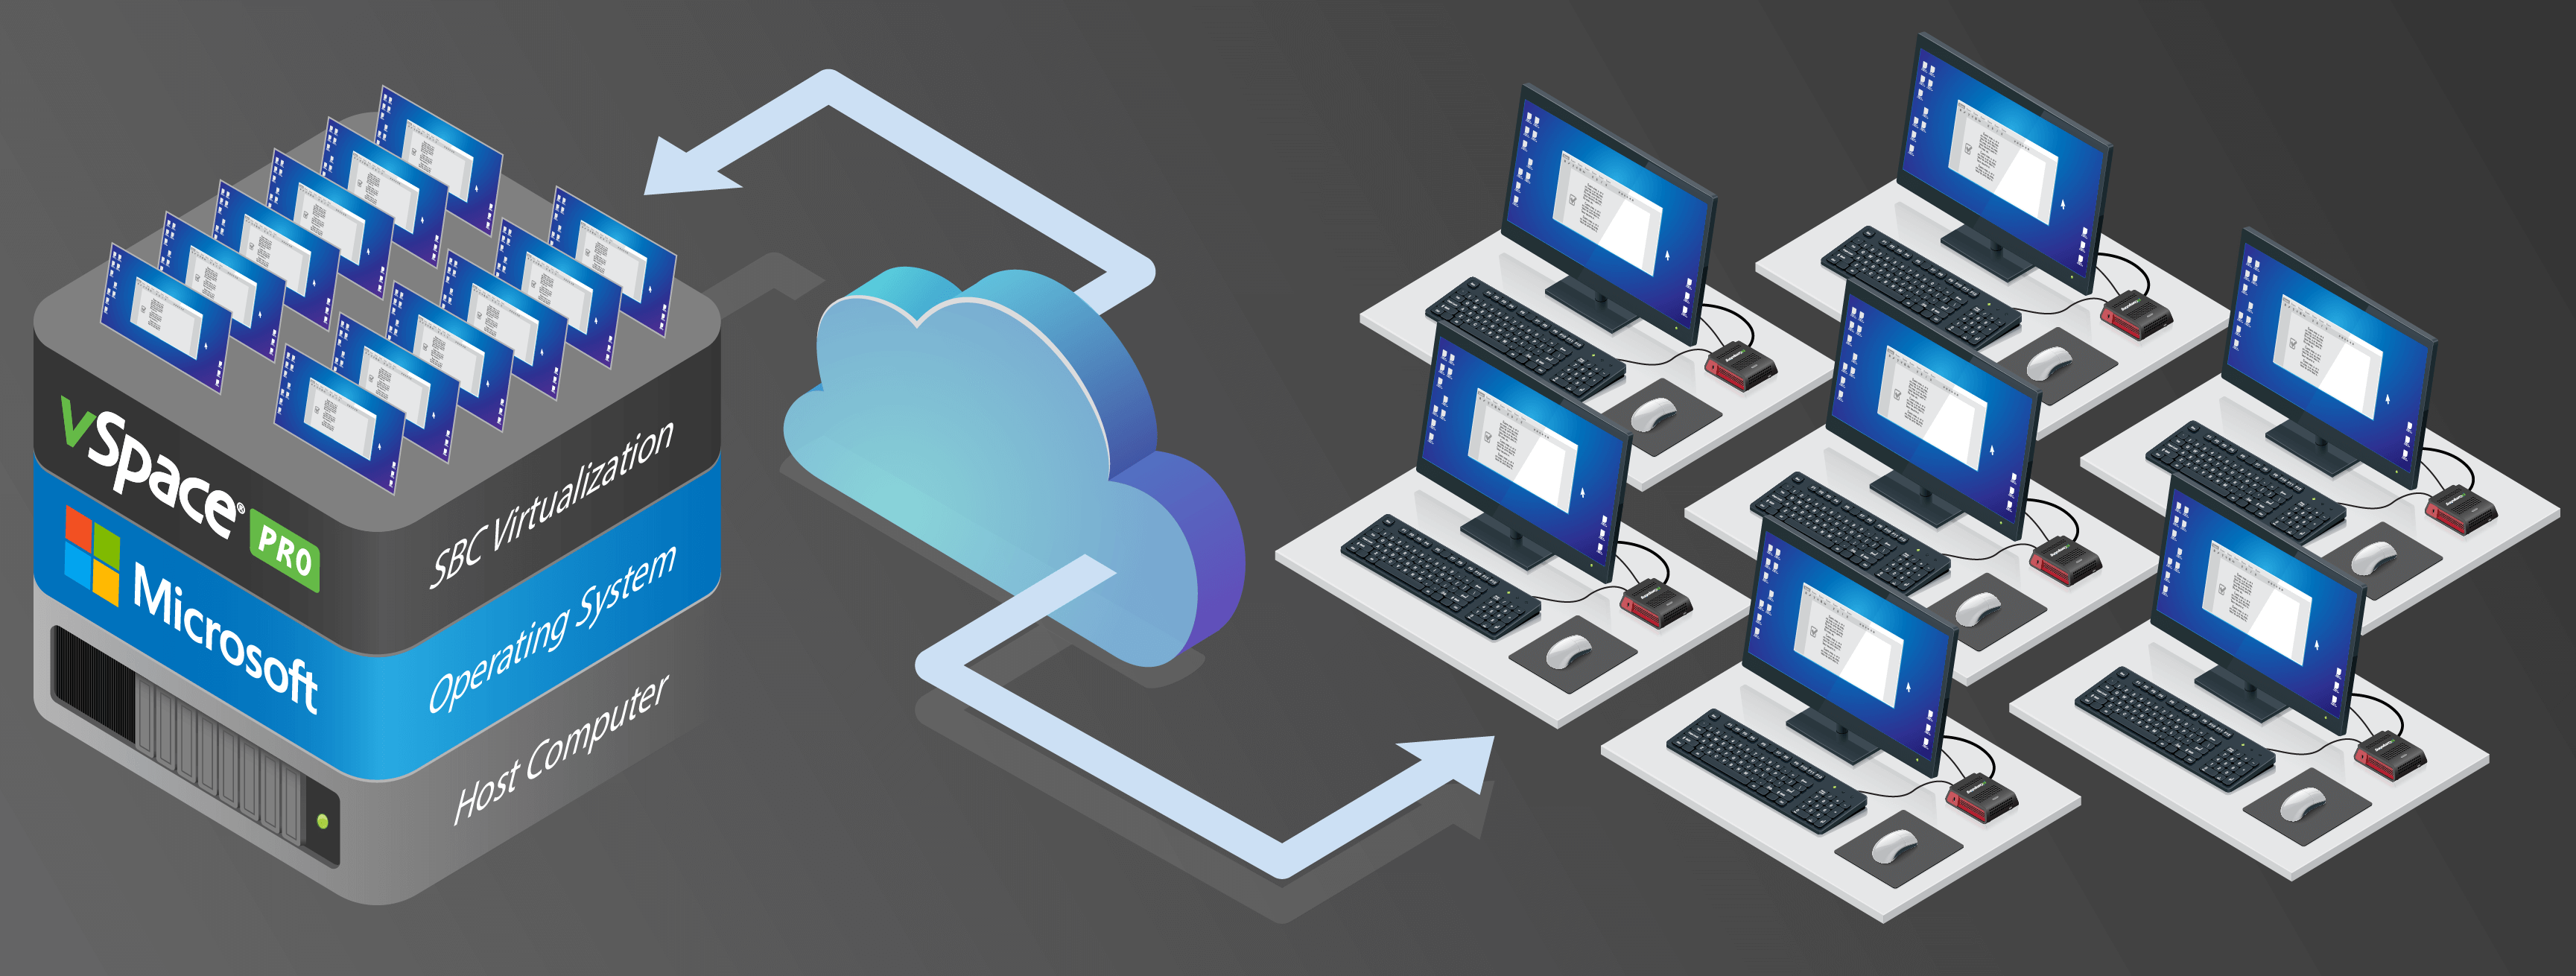 vSpace Pro setup